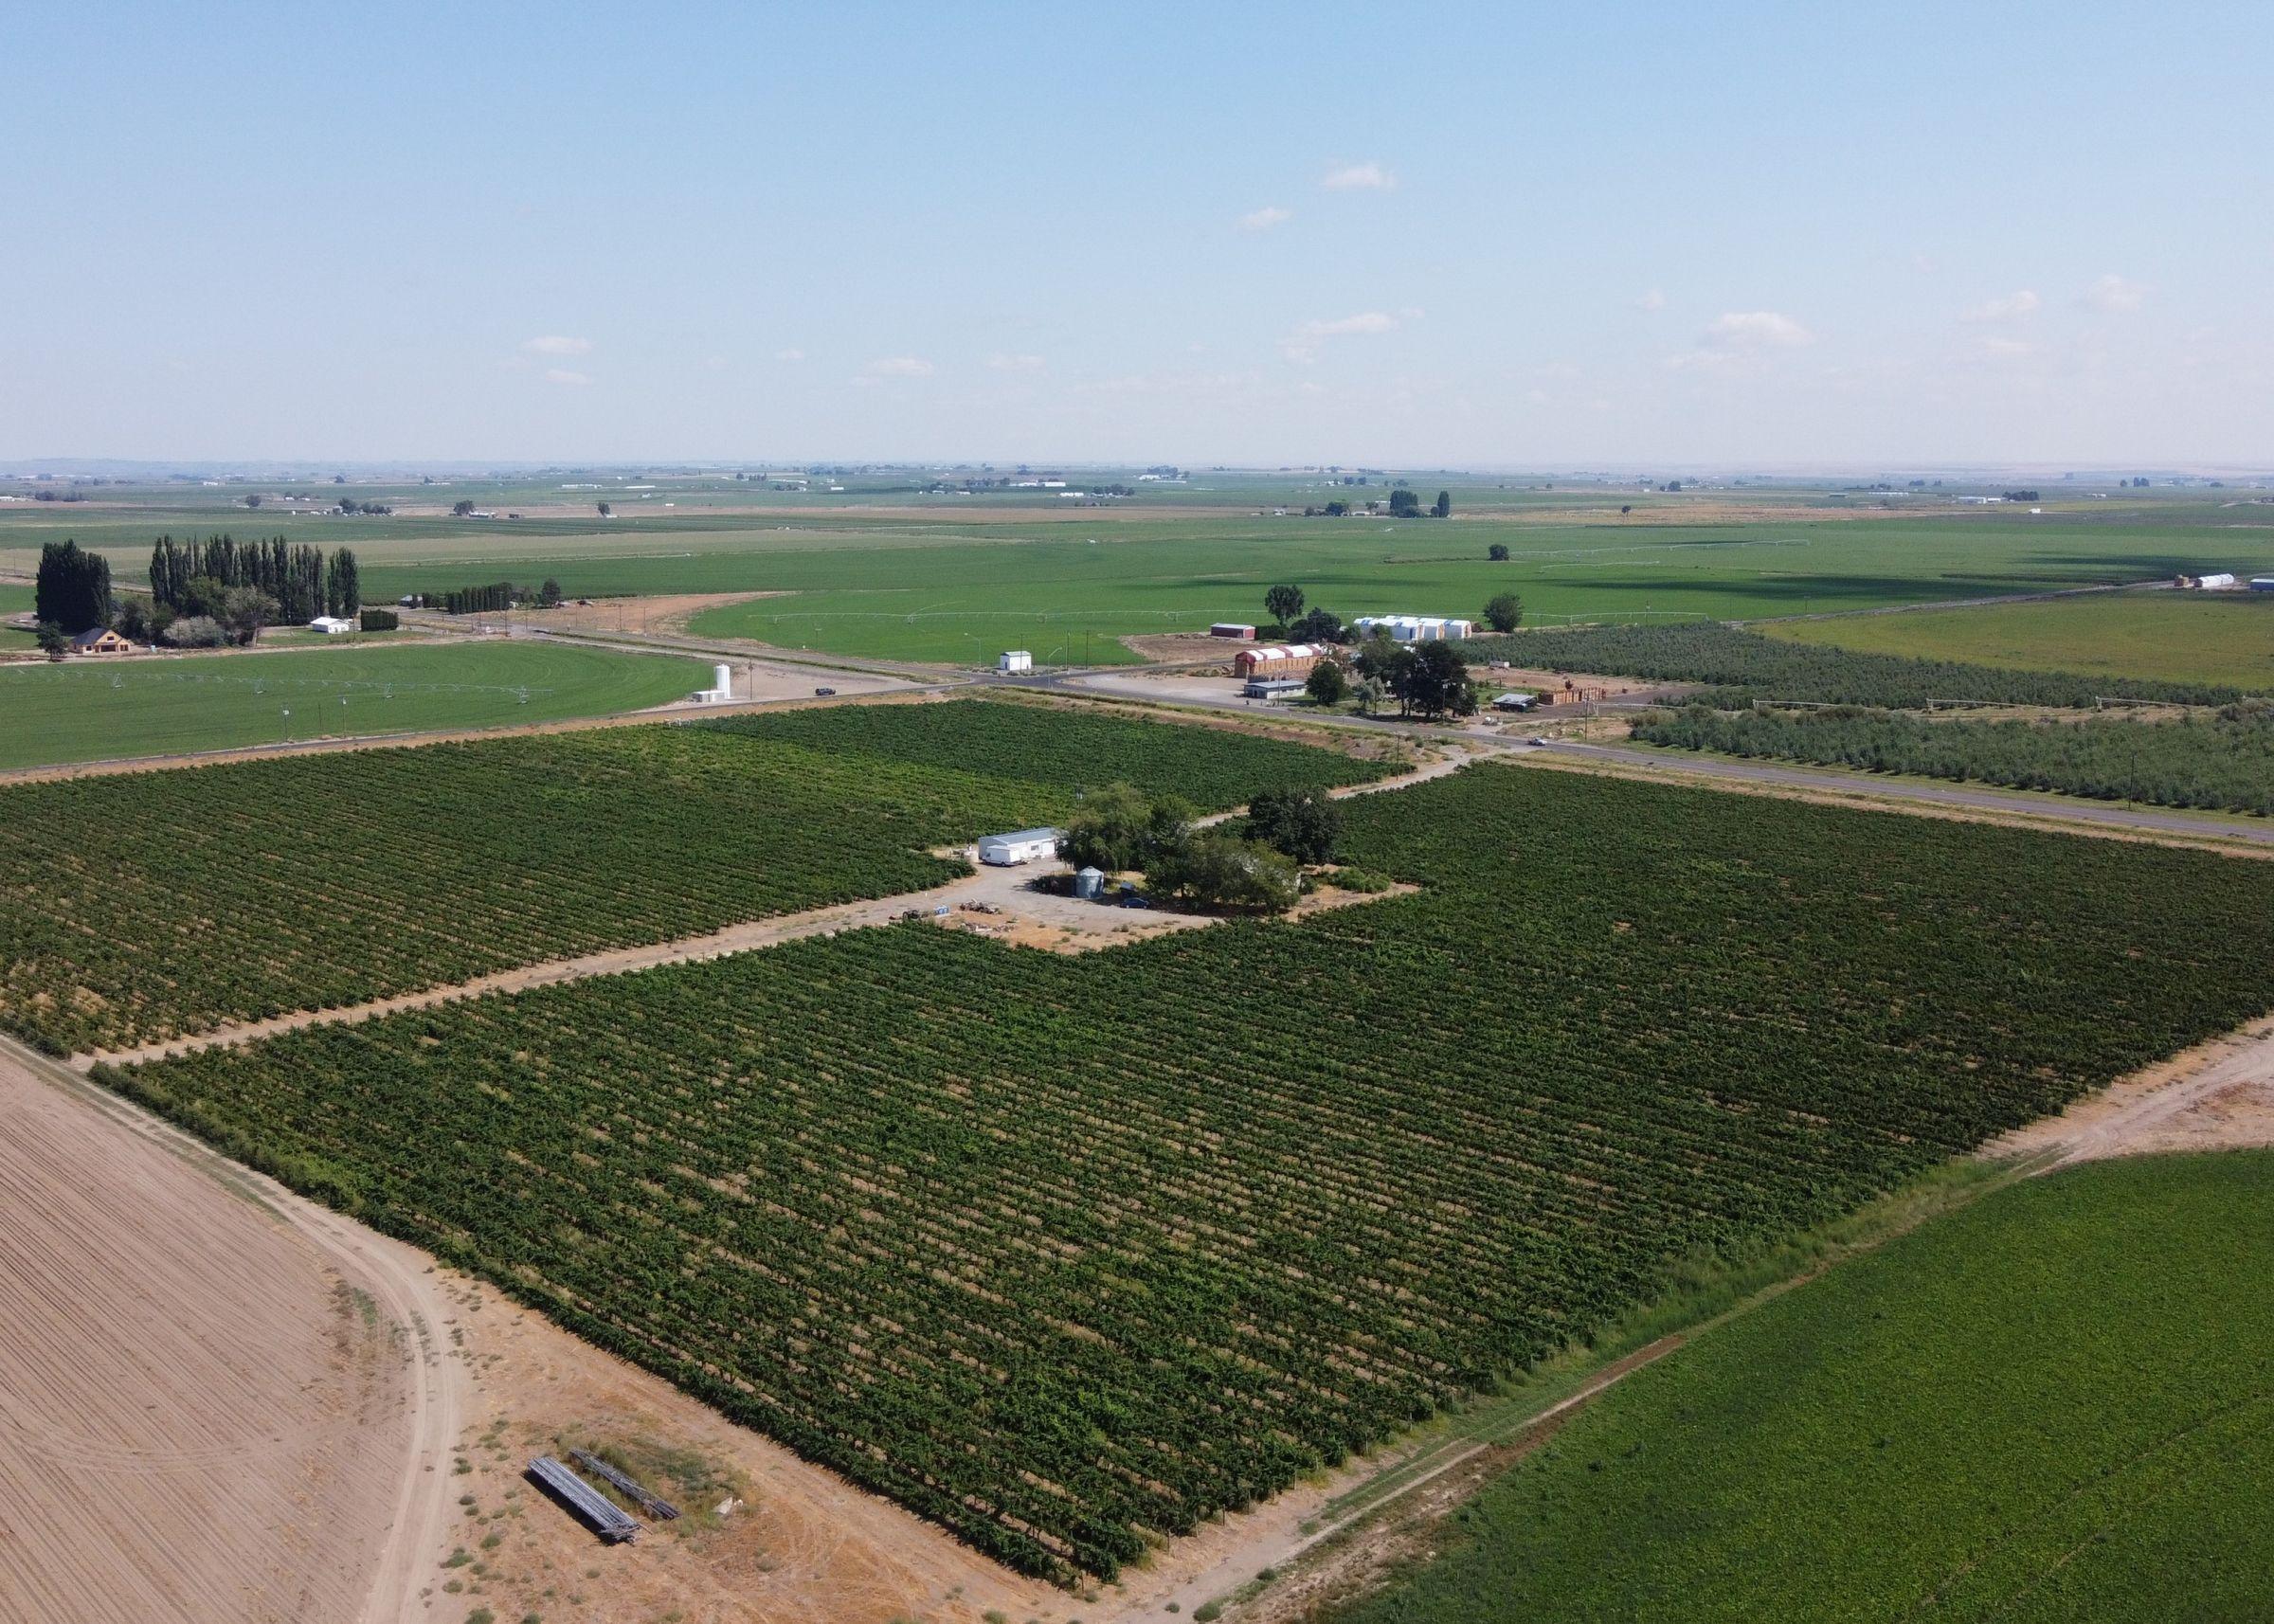 Taylor Flats Vineyard